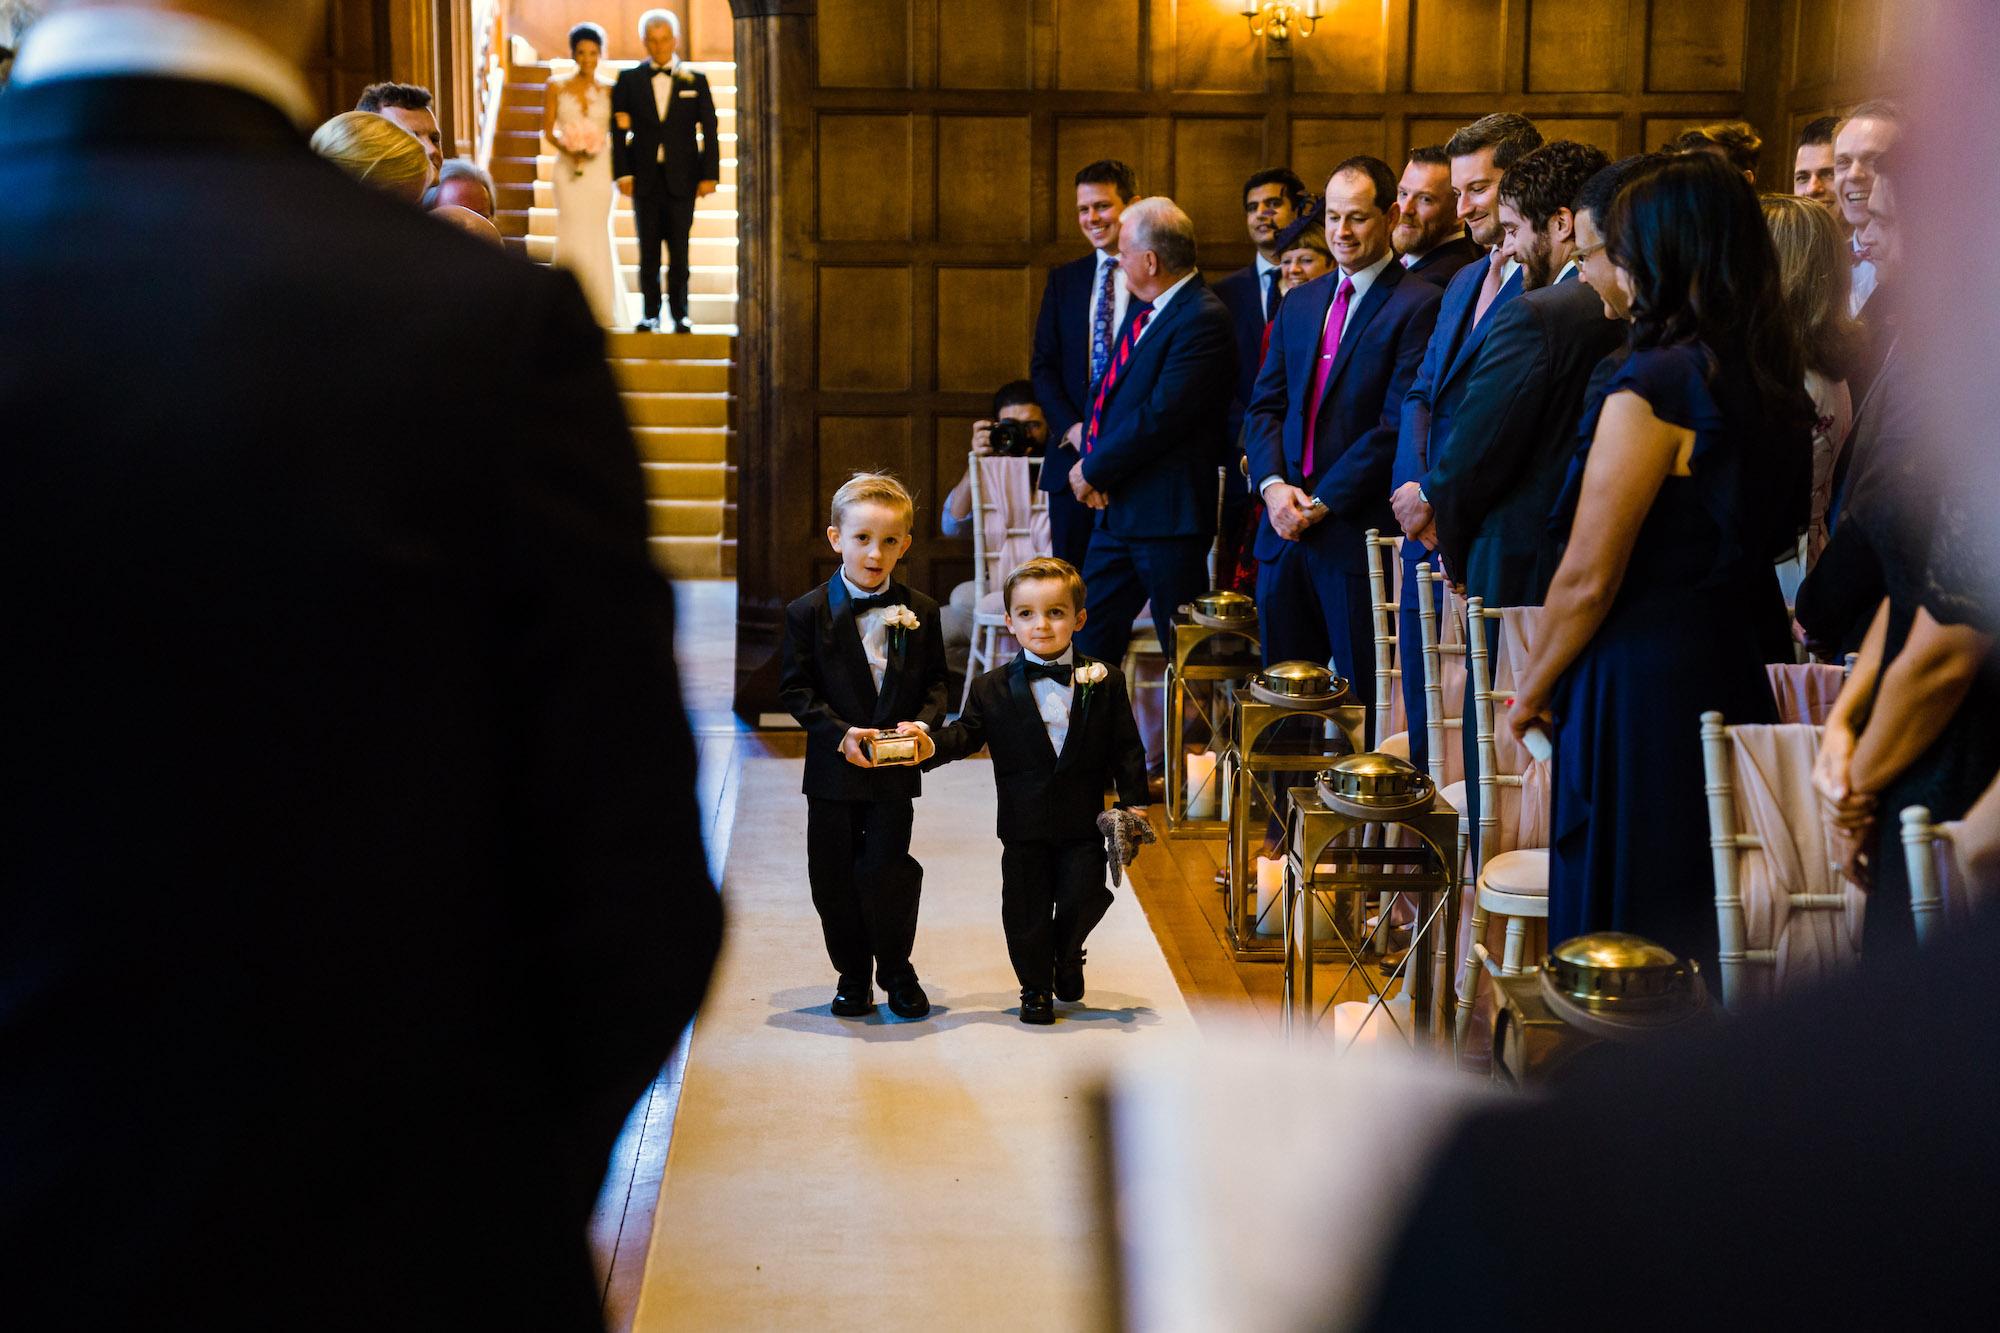 34   Hengrave Hall Wedding   Suffolk Wedding   Lamare London   Luxury Wedding Planner   Jon Mold Photography.jpg